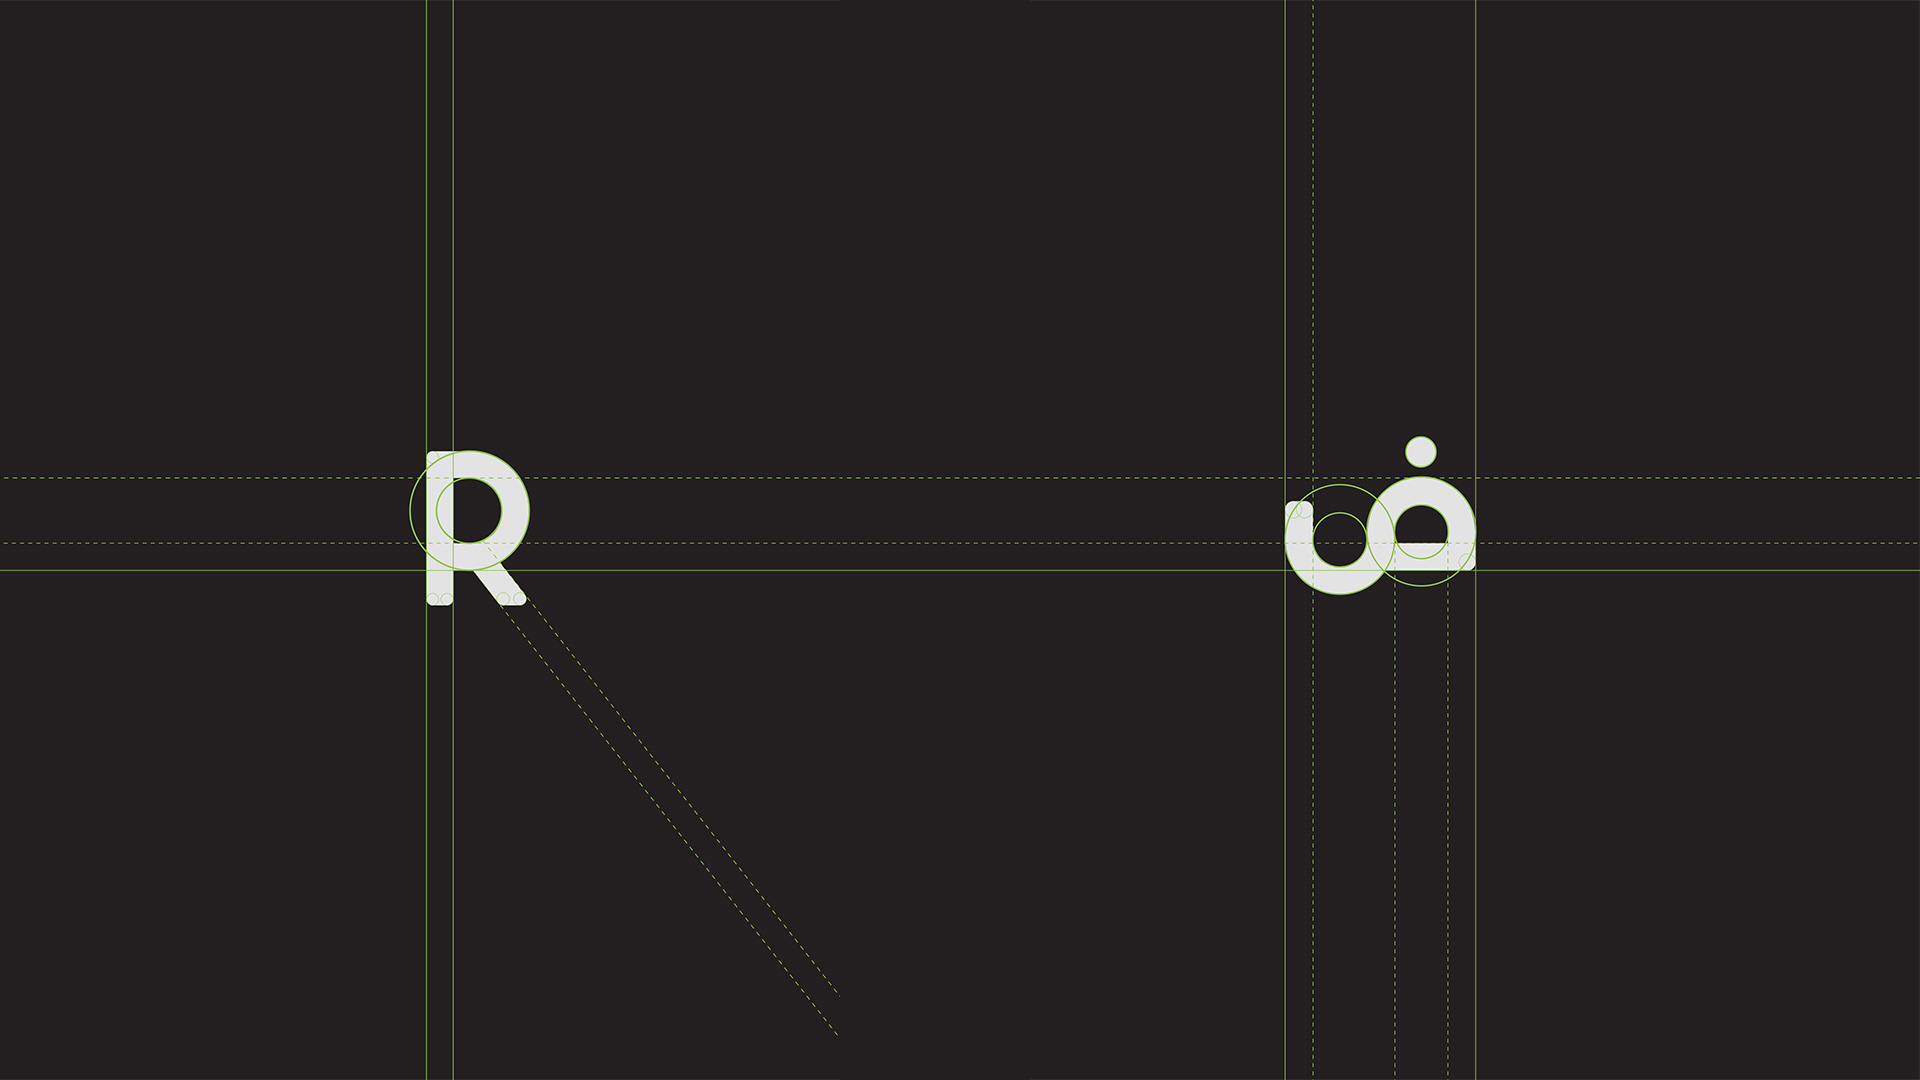 RTM_02